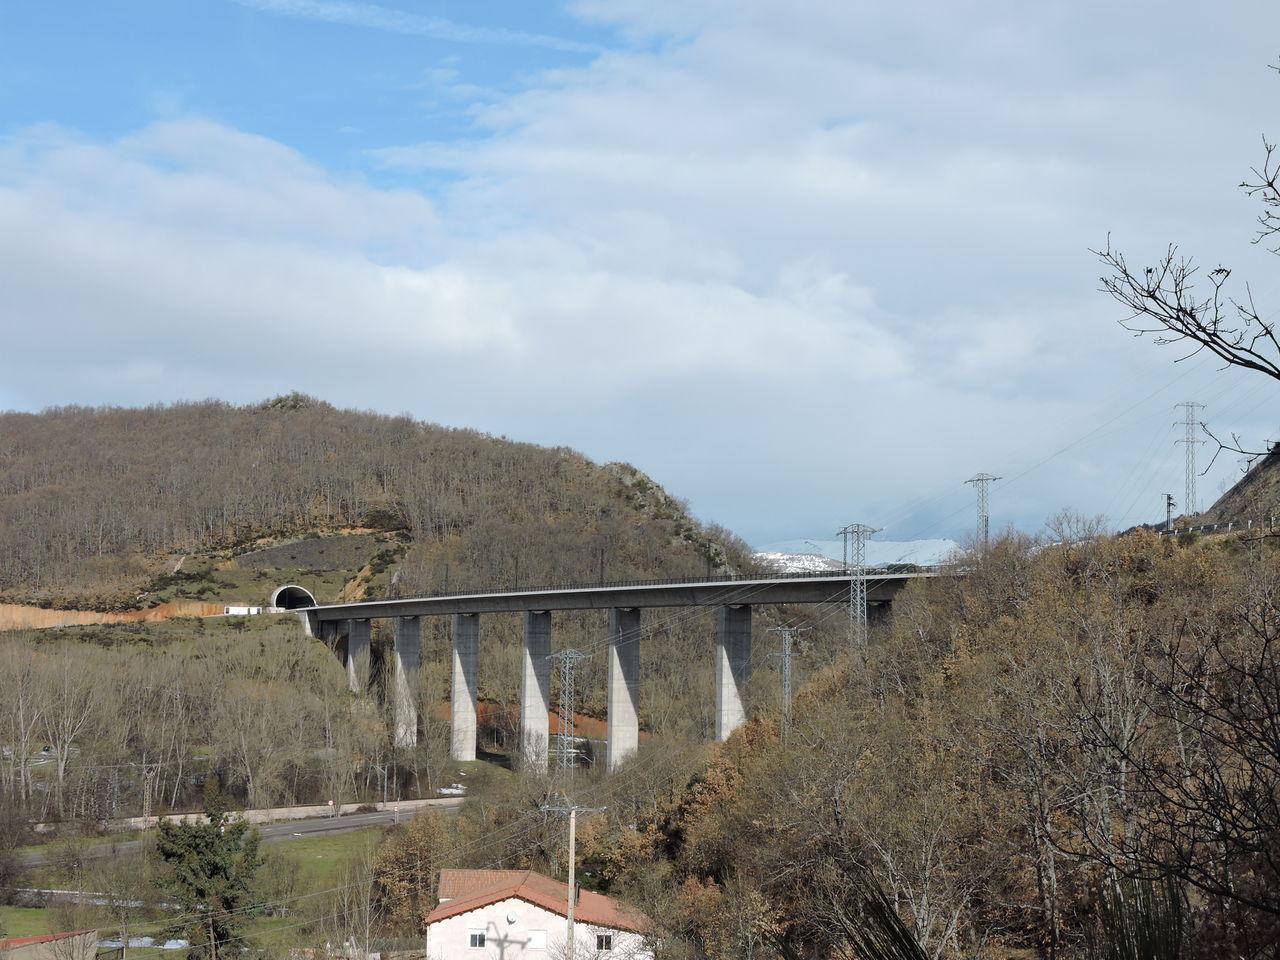 Tunnel on the León-Asturias high-speed line